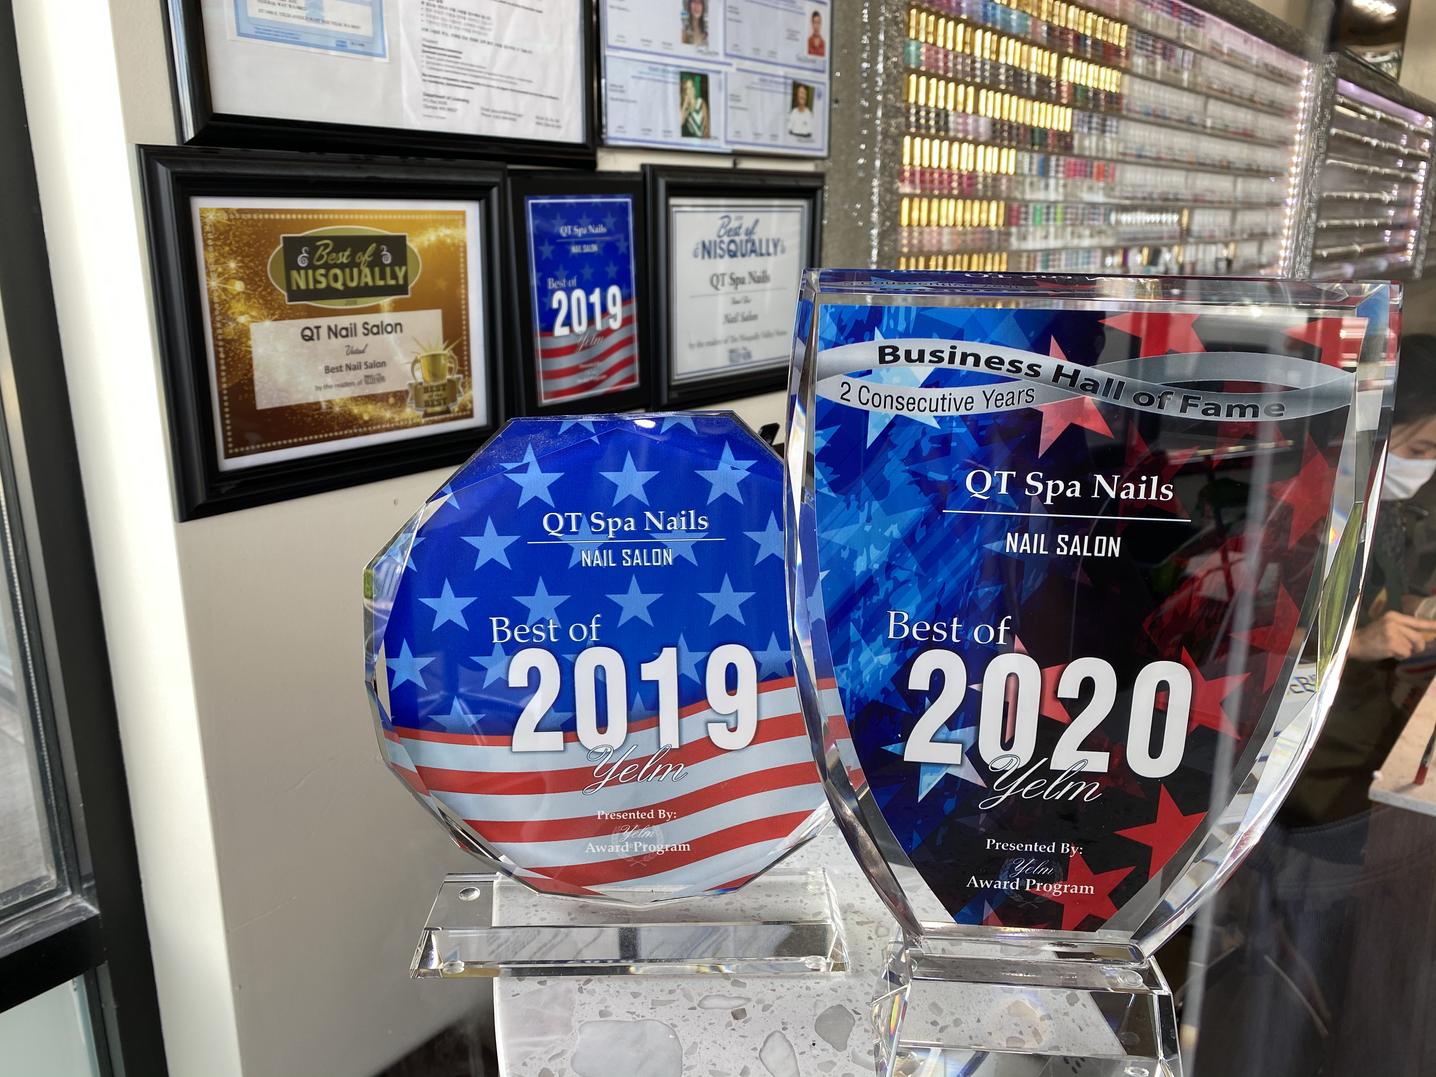 Won Best Nail salon in Yelm 2018, 2019, 2020